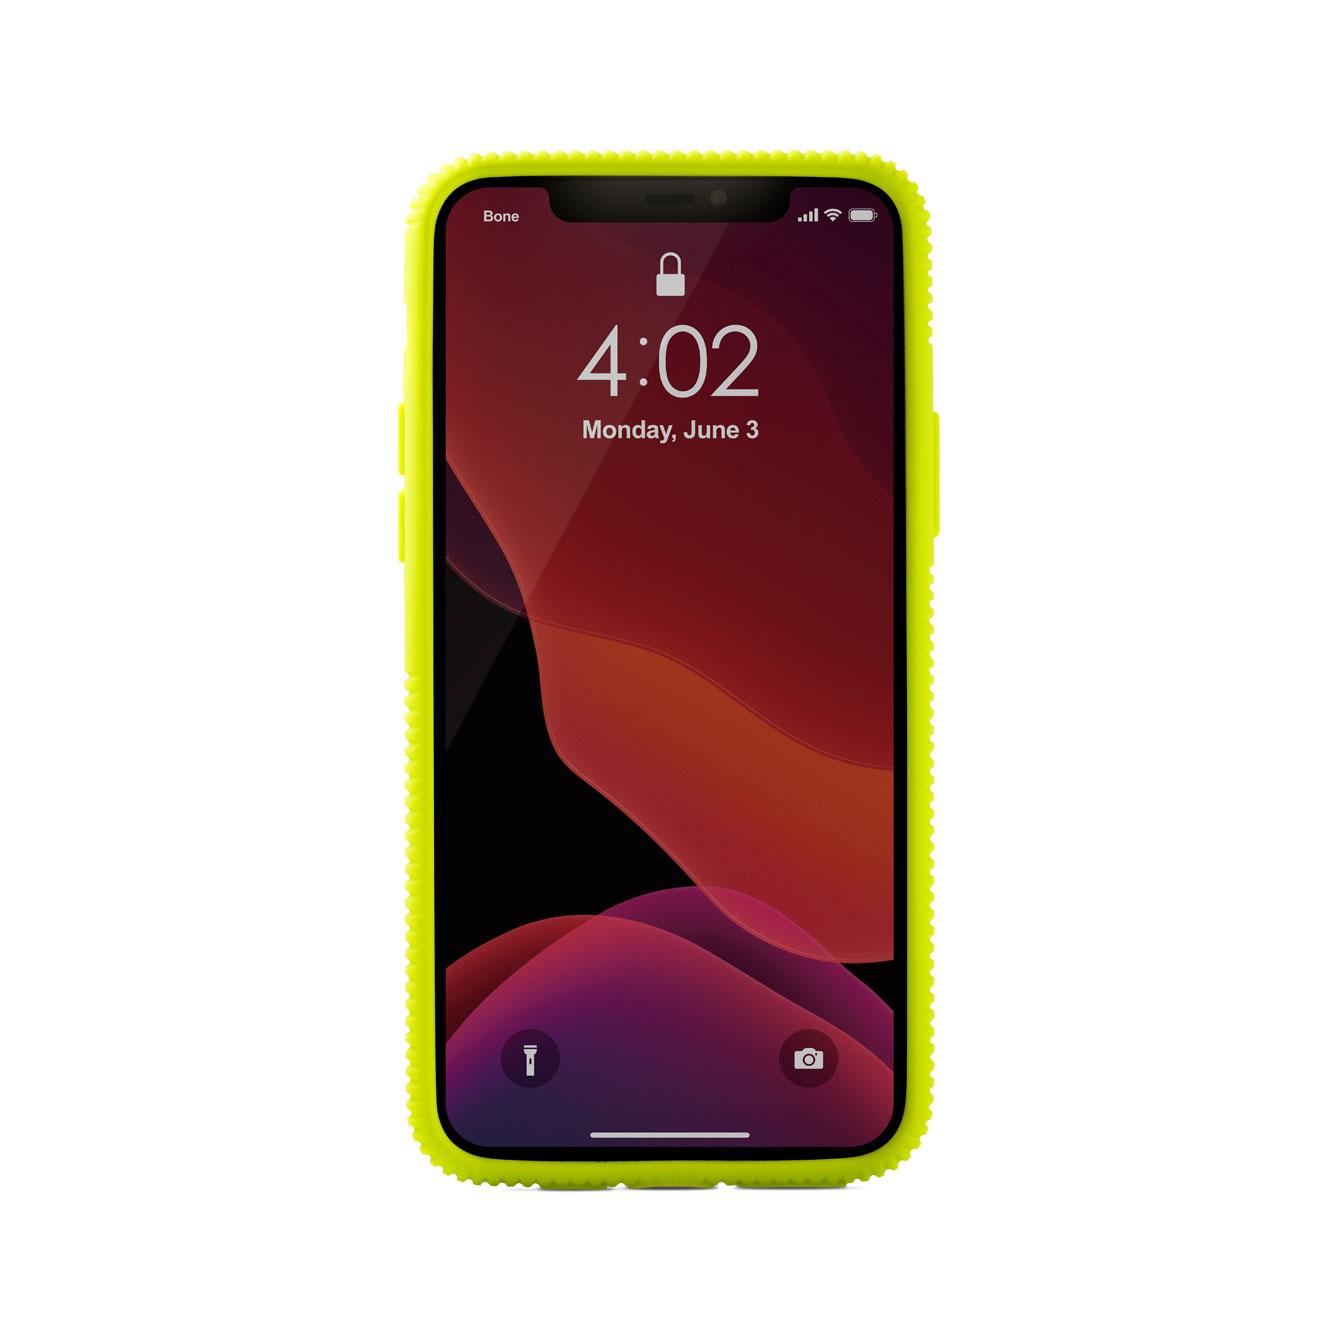 CP194 USB Charging Port Anti Dust Plug Cute Little Poached Egg Pendant Phone Charm for iPhone 11// XS MAX//XR//X//8 Plus//7//6S//8//SE iPad iPod